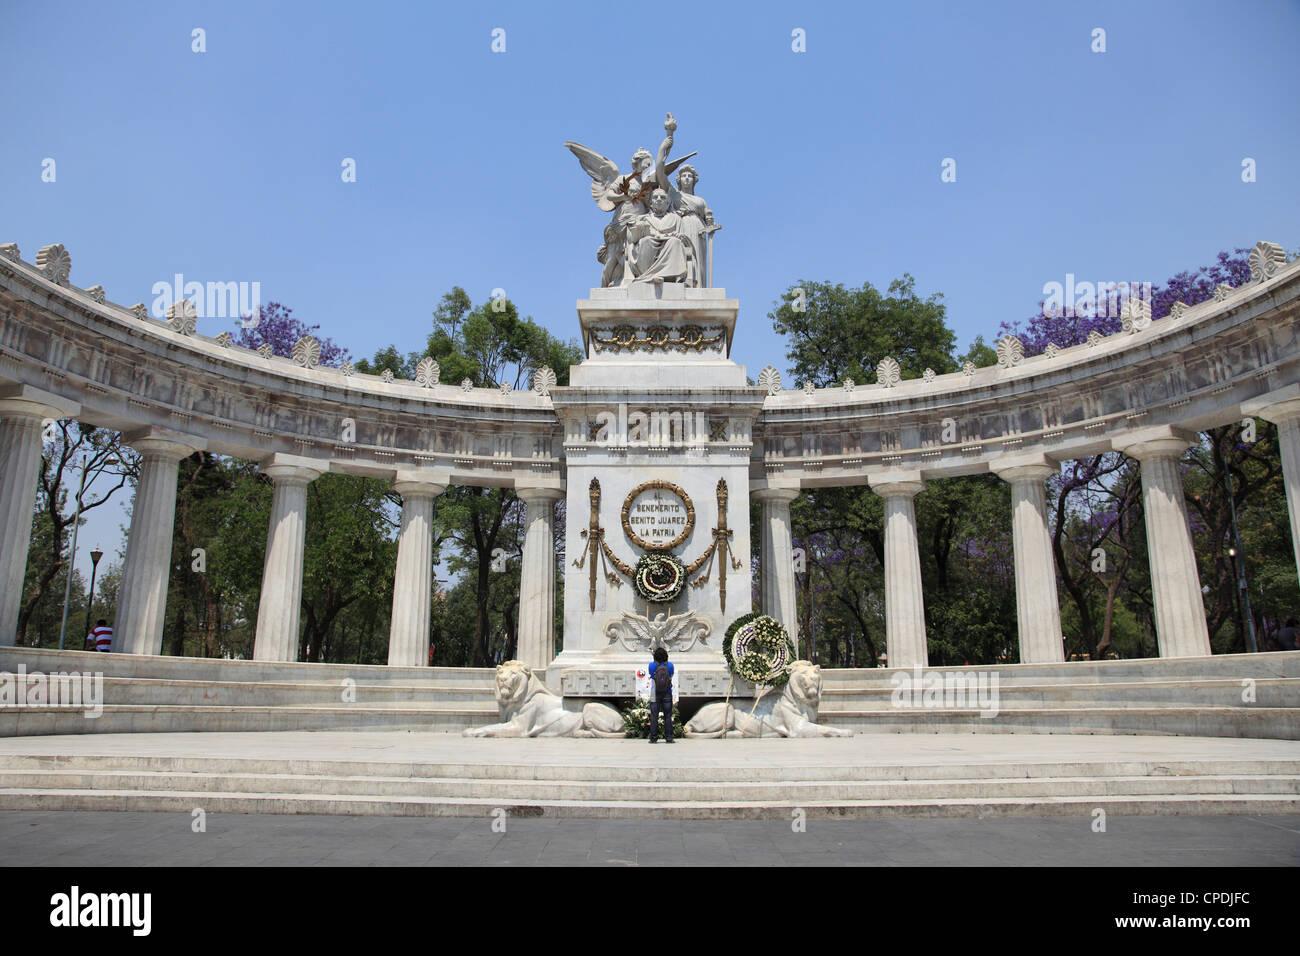 Hemiciclo a Juárez (Monumento de Benito Juárez), Alameda, ciudad de México, México, América Imagen De Stock